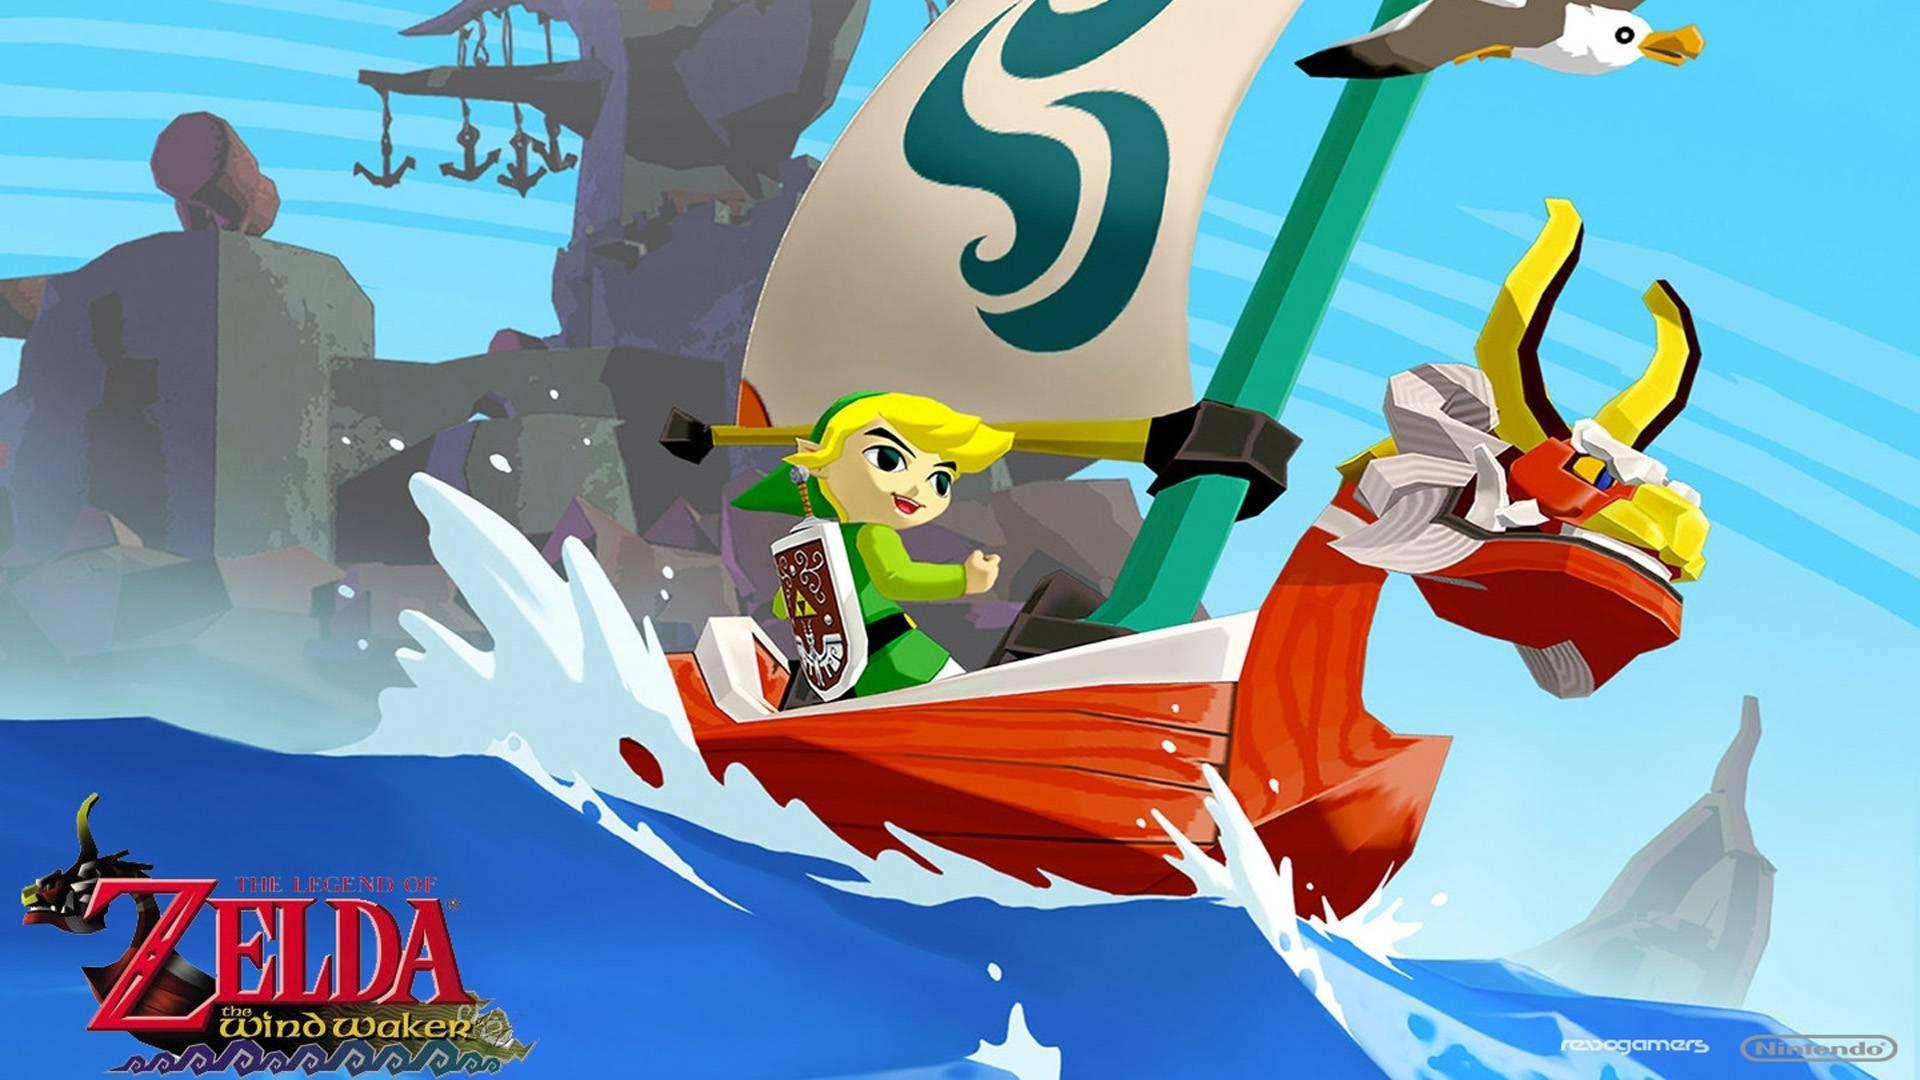 the legend of zelda: the wind waker hd full hd fond d'écran and